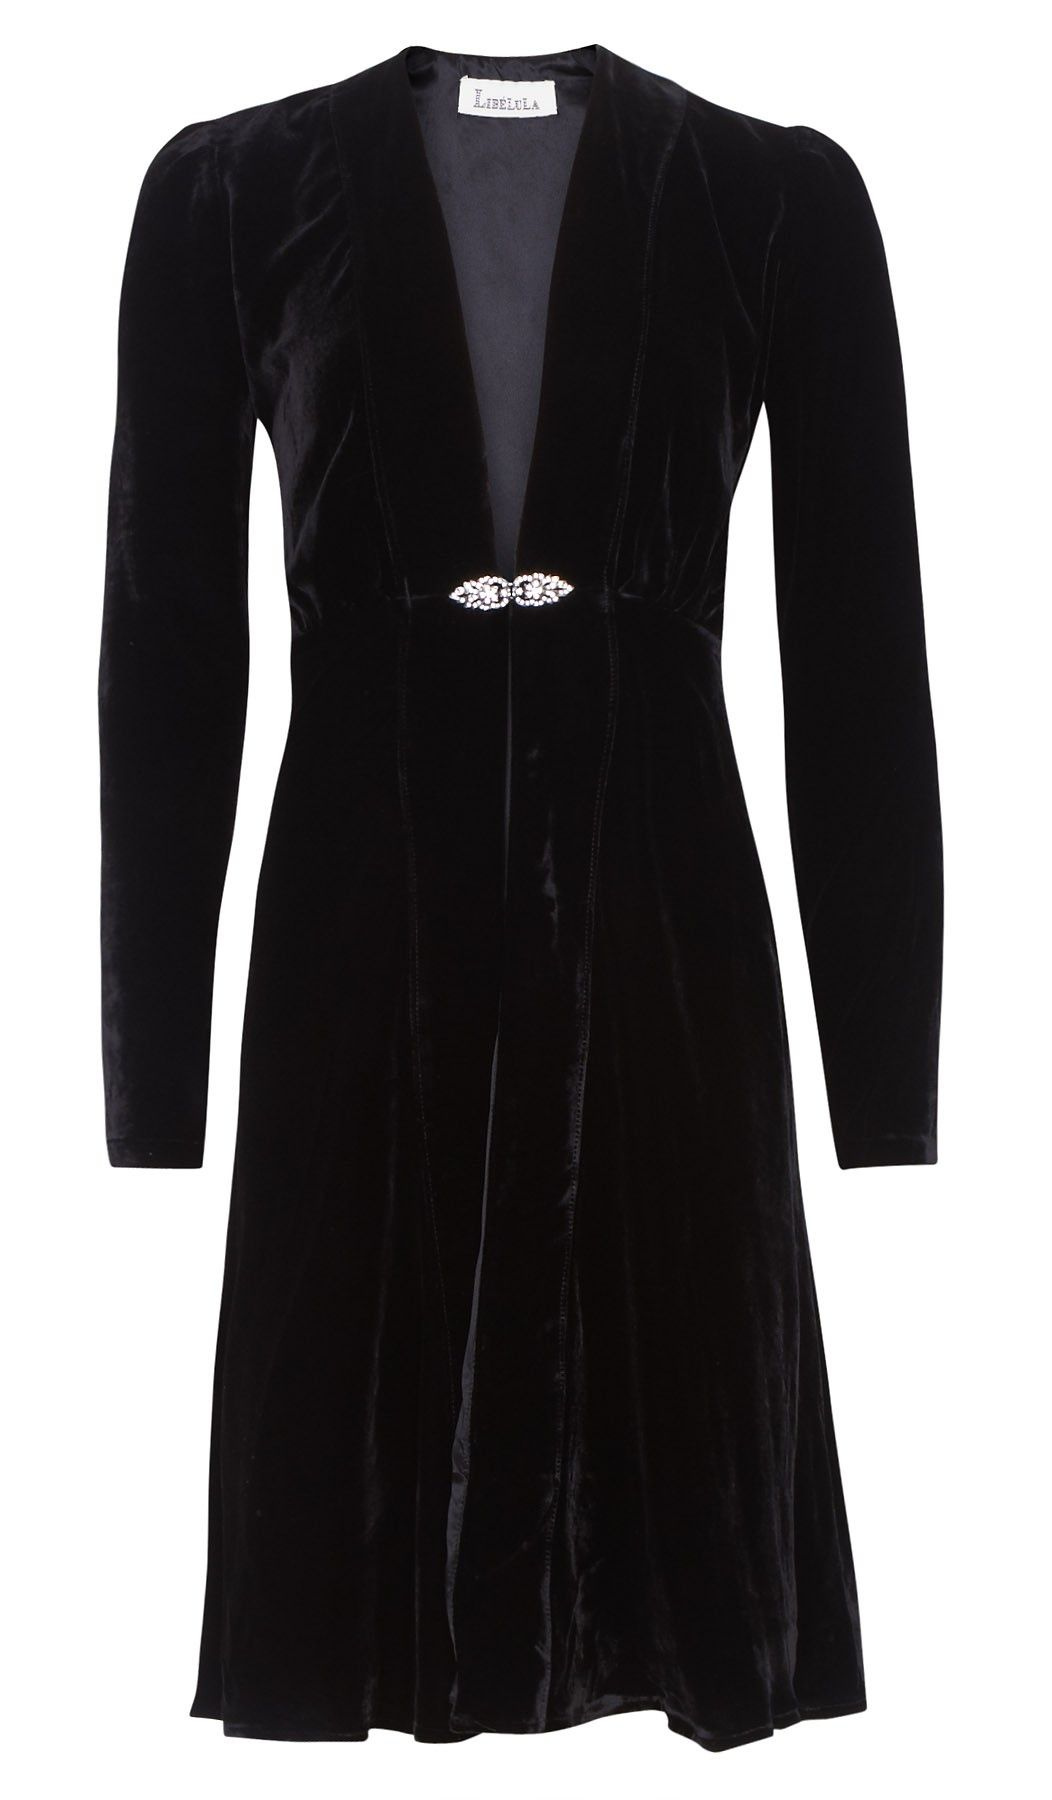 Libelula Dulwich Coat Velvet - New In - New In   Austique   Duchess ... c6b6cc970e5